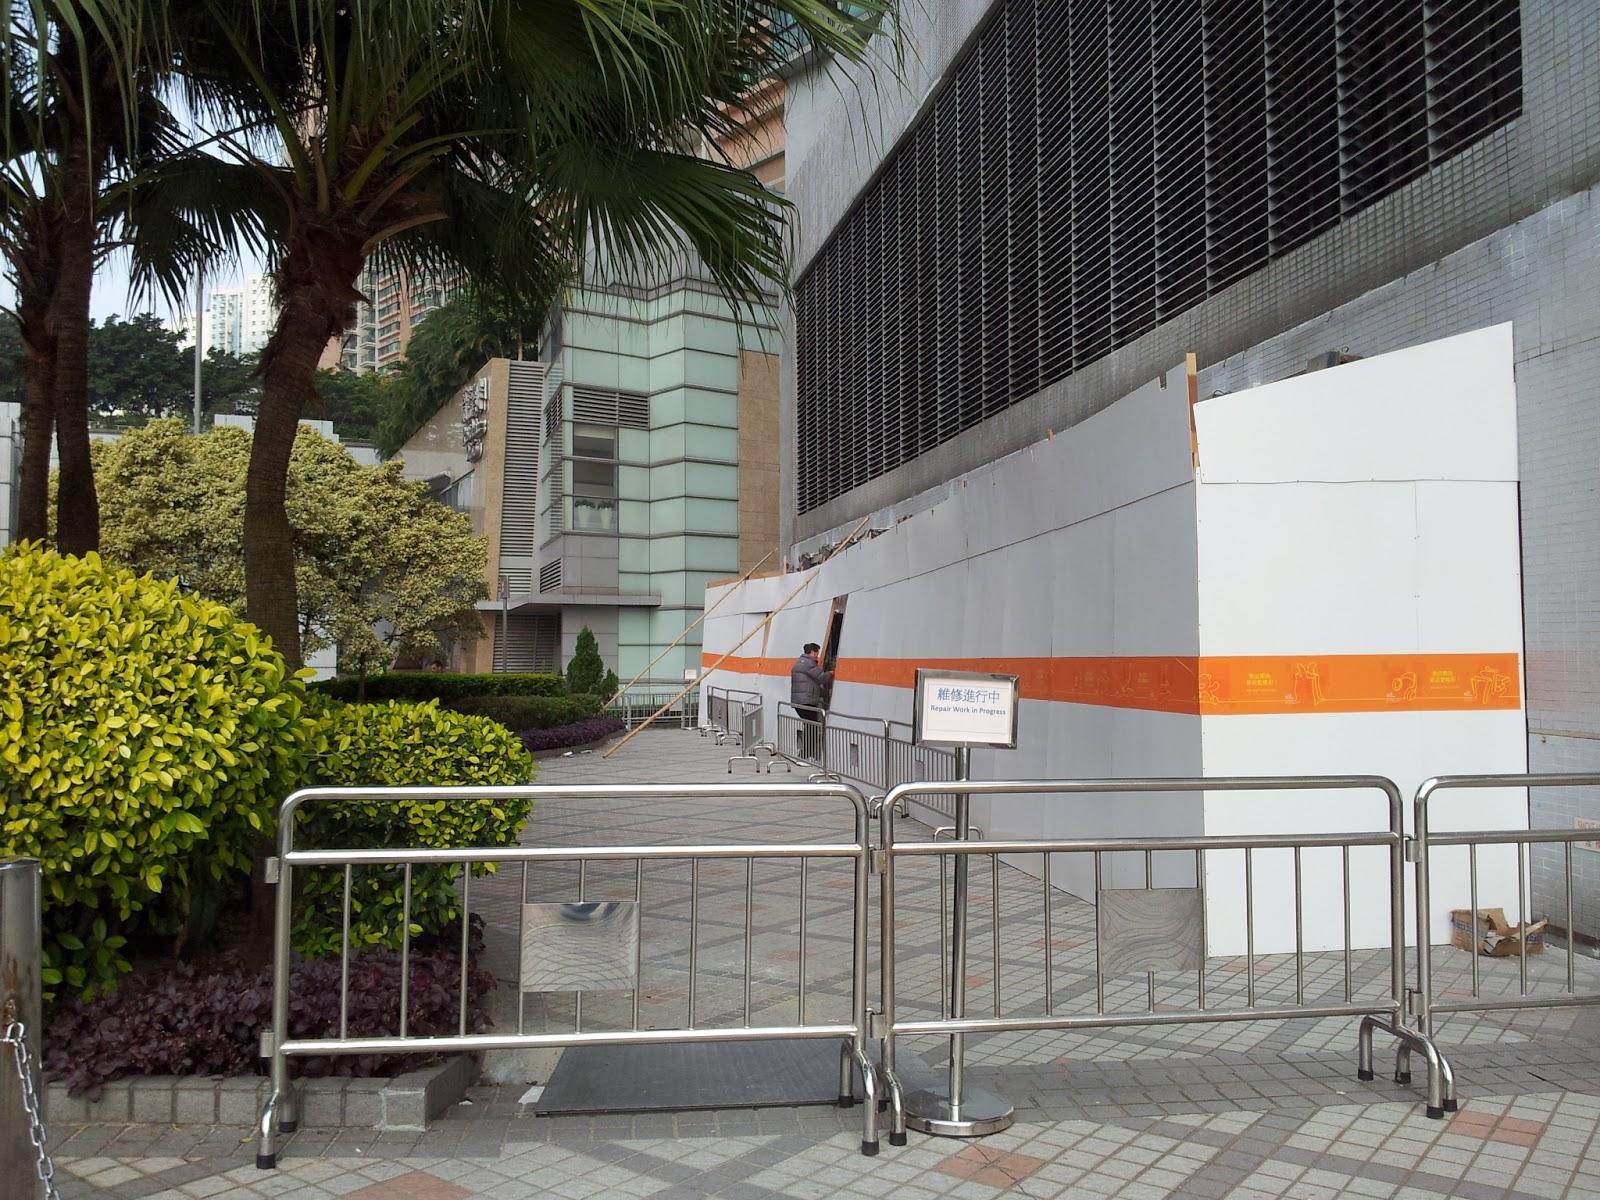 Grassroots O2: 巡視業務.領匯.海悅豪園購物商場 @2013-12-28